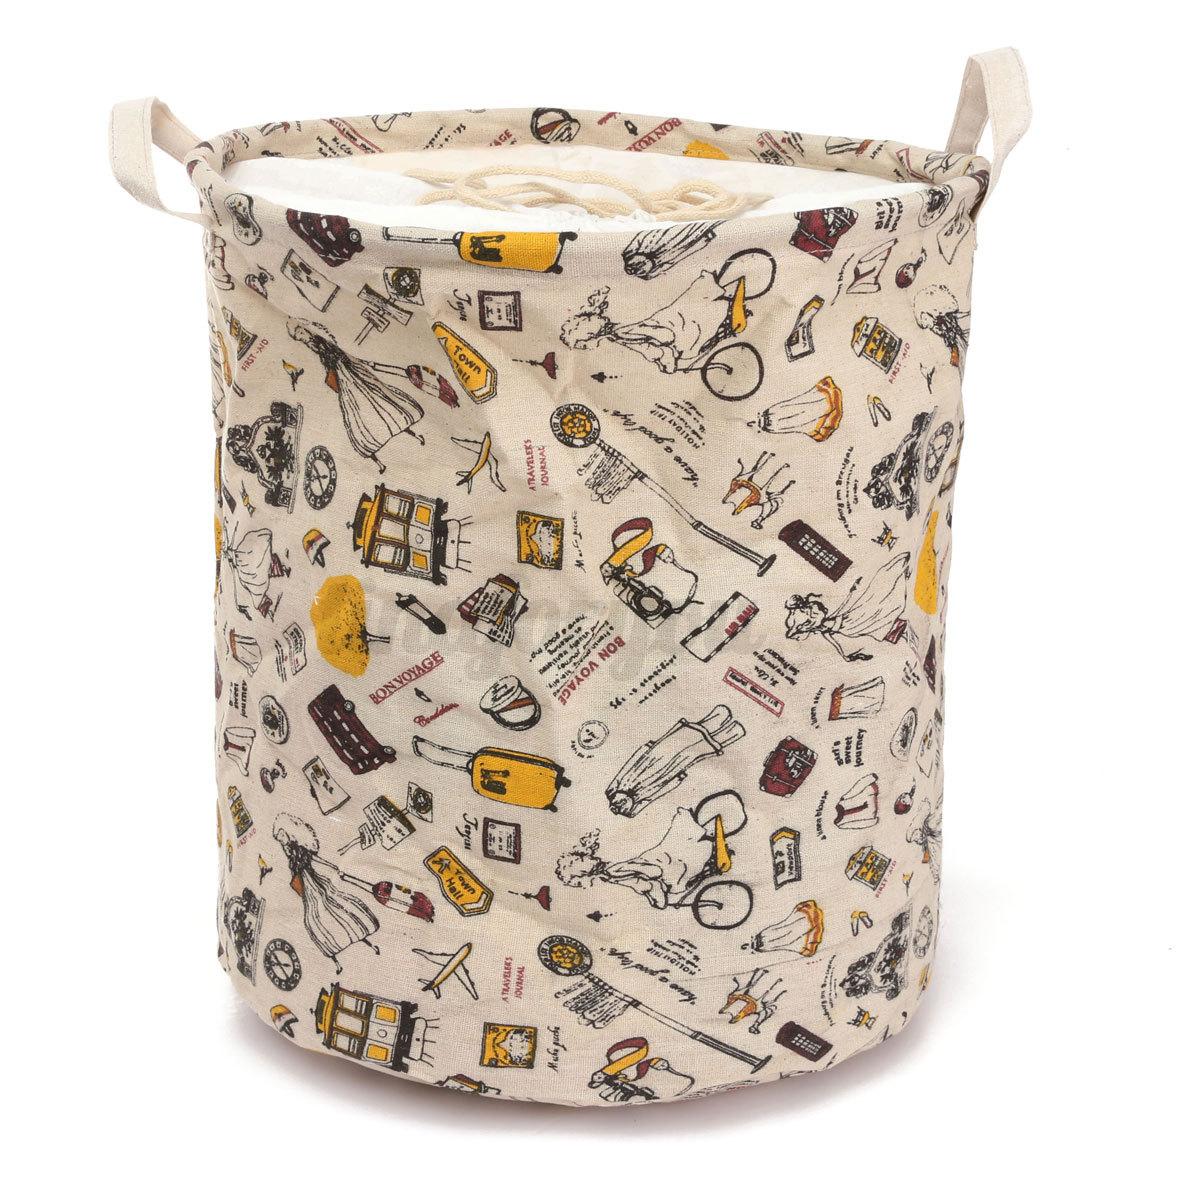 vari s panier linge laver pliable lavage sac rangement stockage v tement jouet ebay. Black Bedroom Furniture Sets. Home Design Ideas